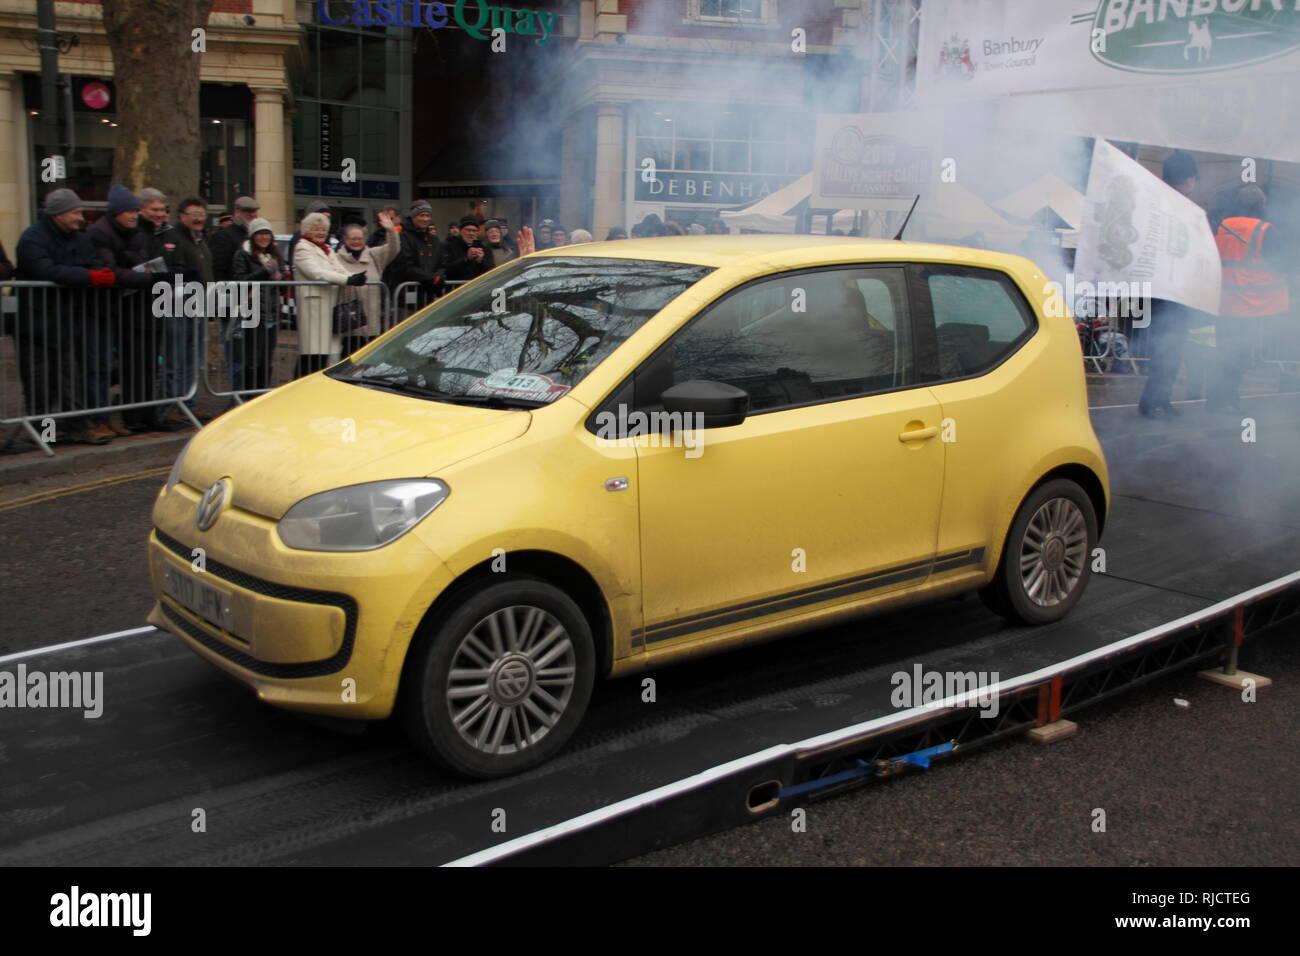 Monte-Carlo Rally Banbury 2019 Stock Photo